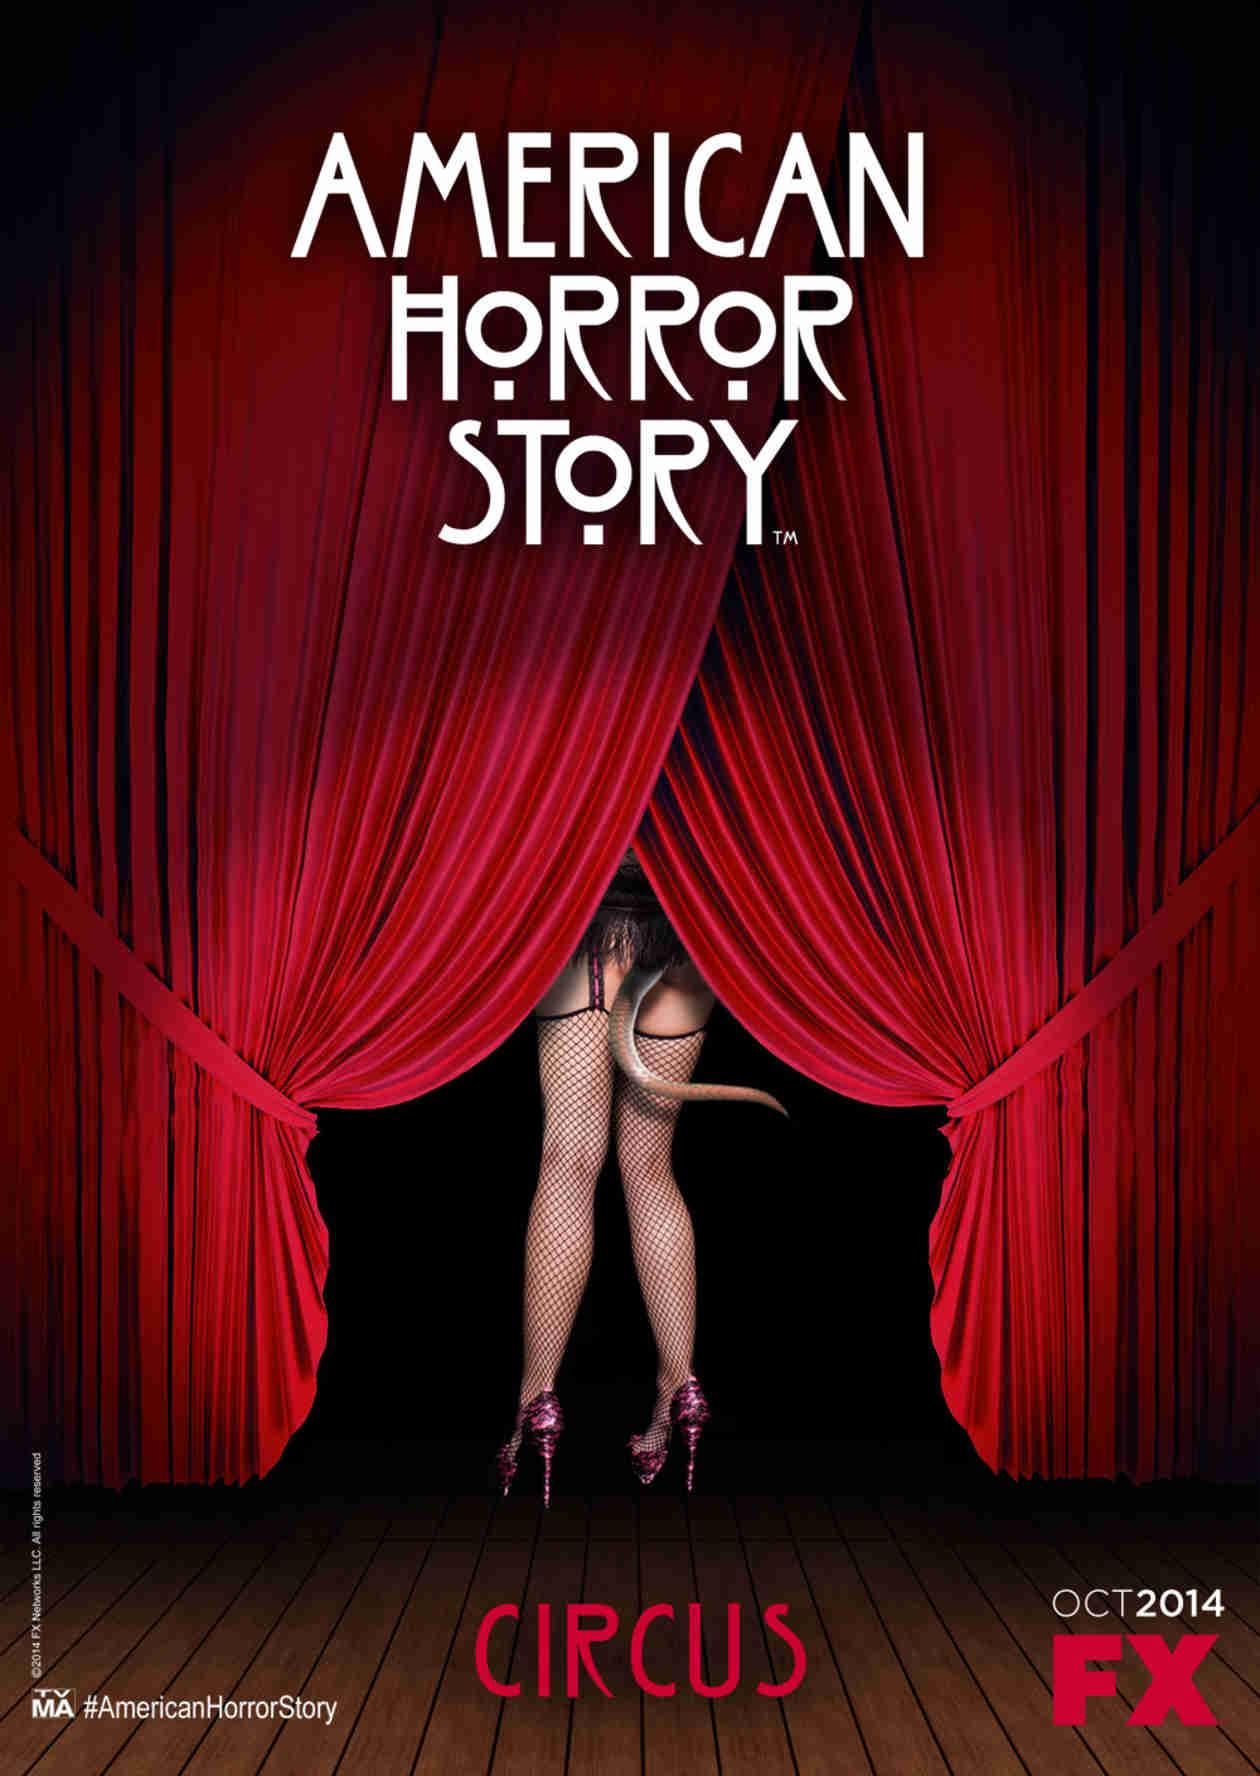 American Horror Story: Freak Show — Patti LaBelle Cast As Gabourey Sidibe's Mom!